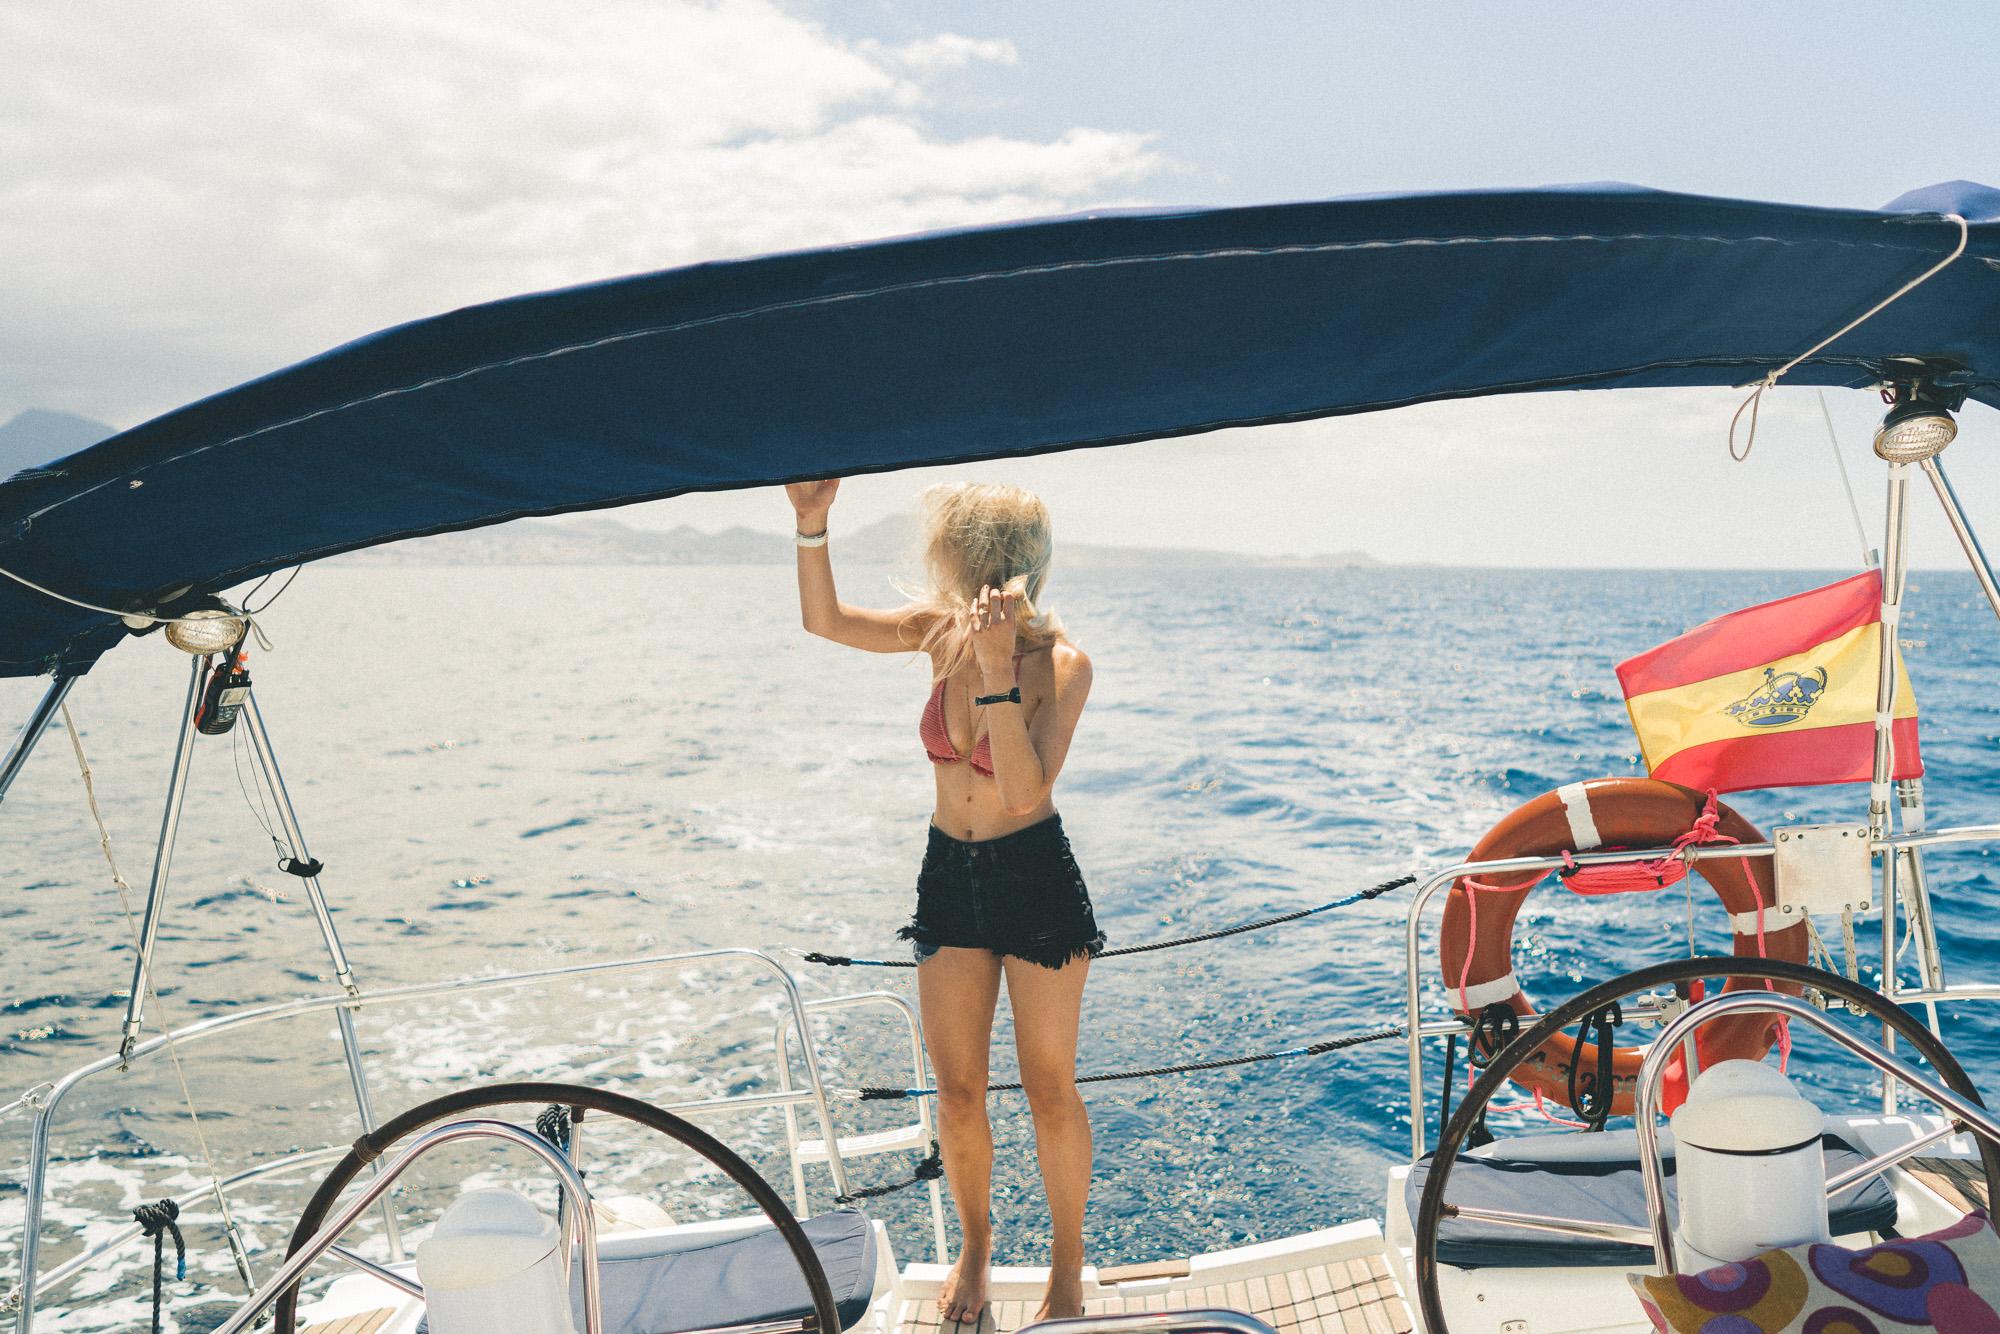 Boat Trip in Tenerife, Canary Islands, Spain